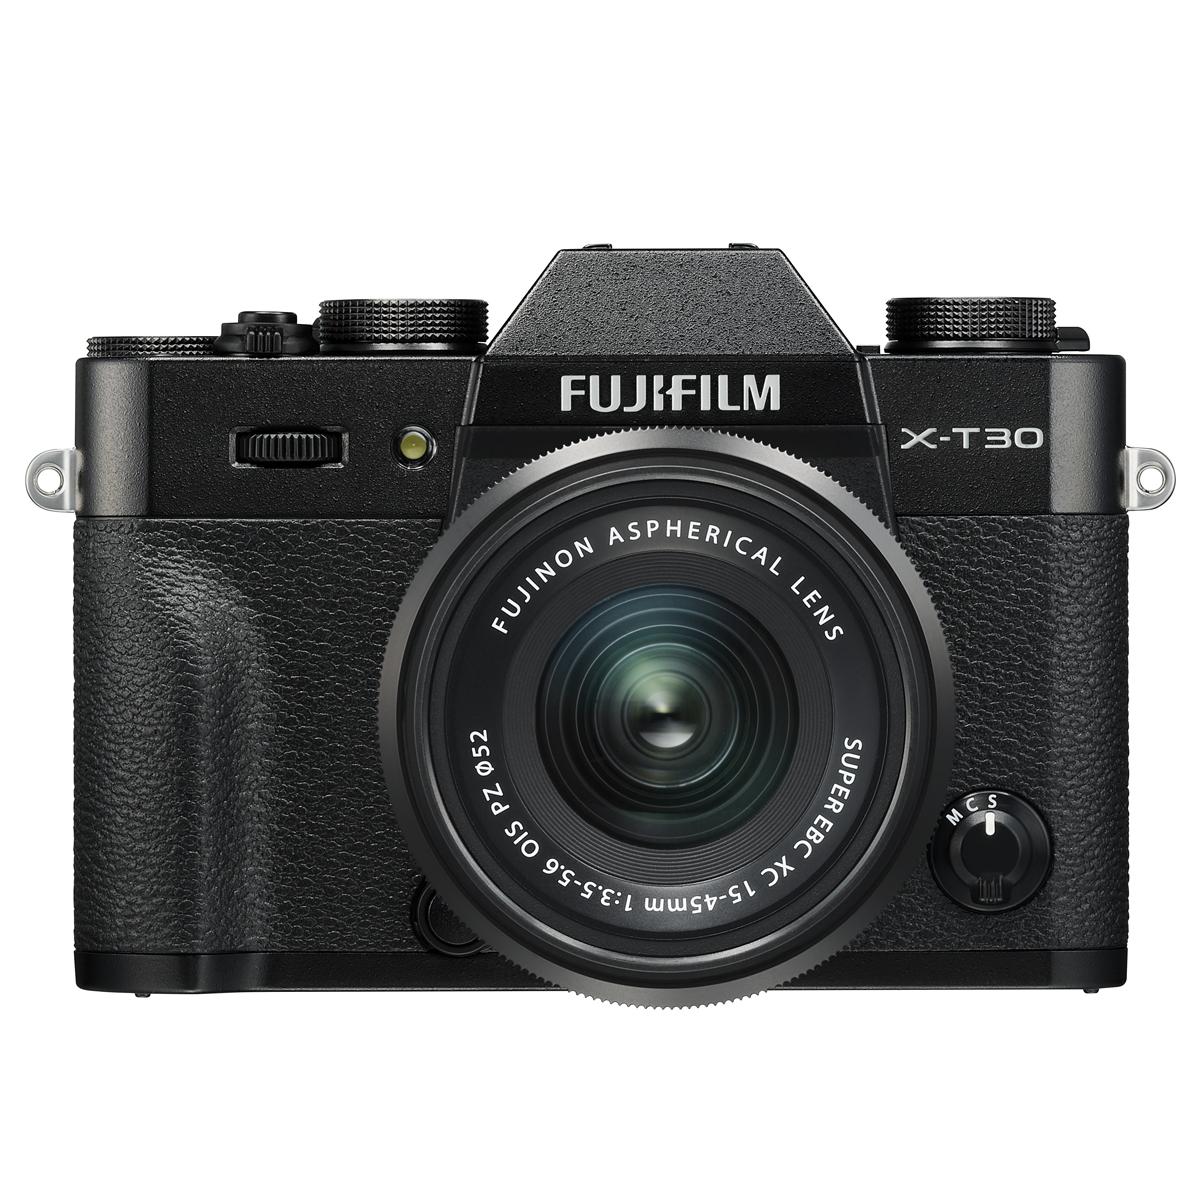 FUJIFILM X-T30 Systemkamera Kit FUJINON XC15-45mmF3.5-5.6 OIS P [ Foto-Partner ProShop GmbH ]